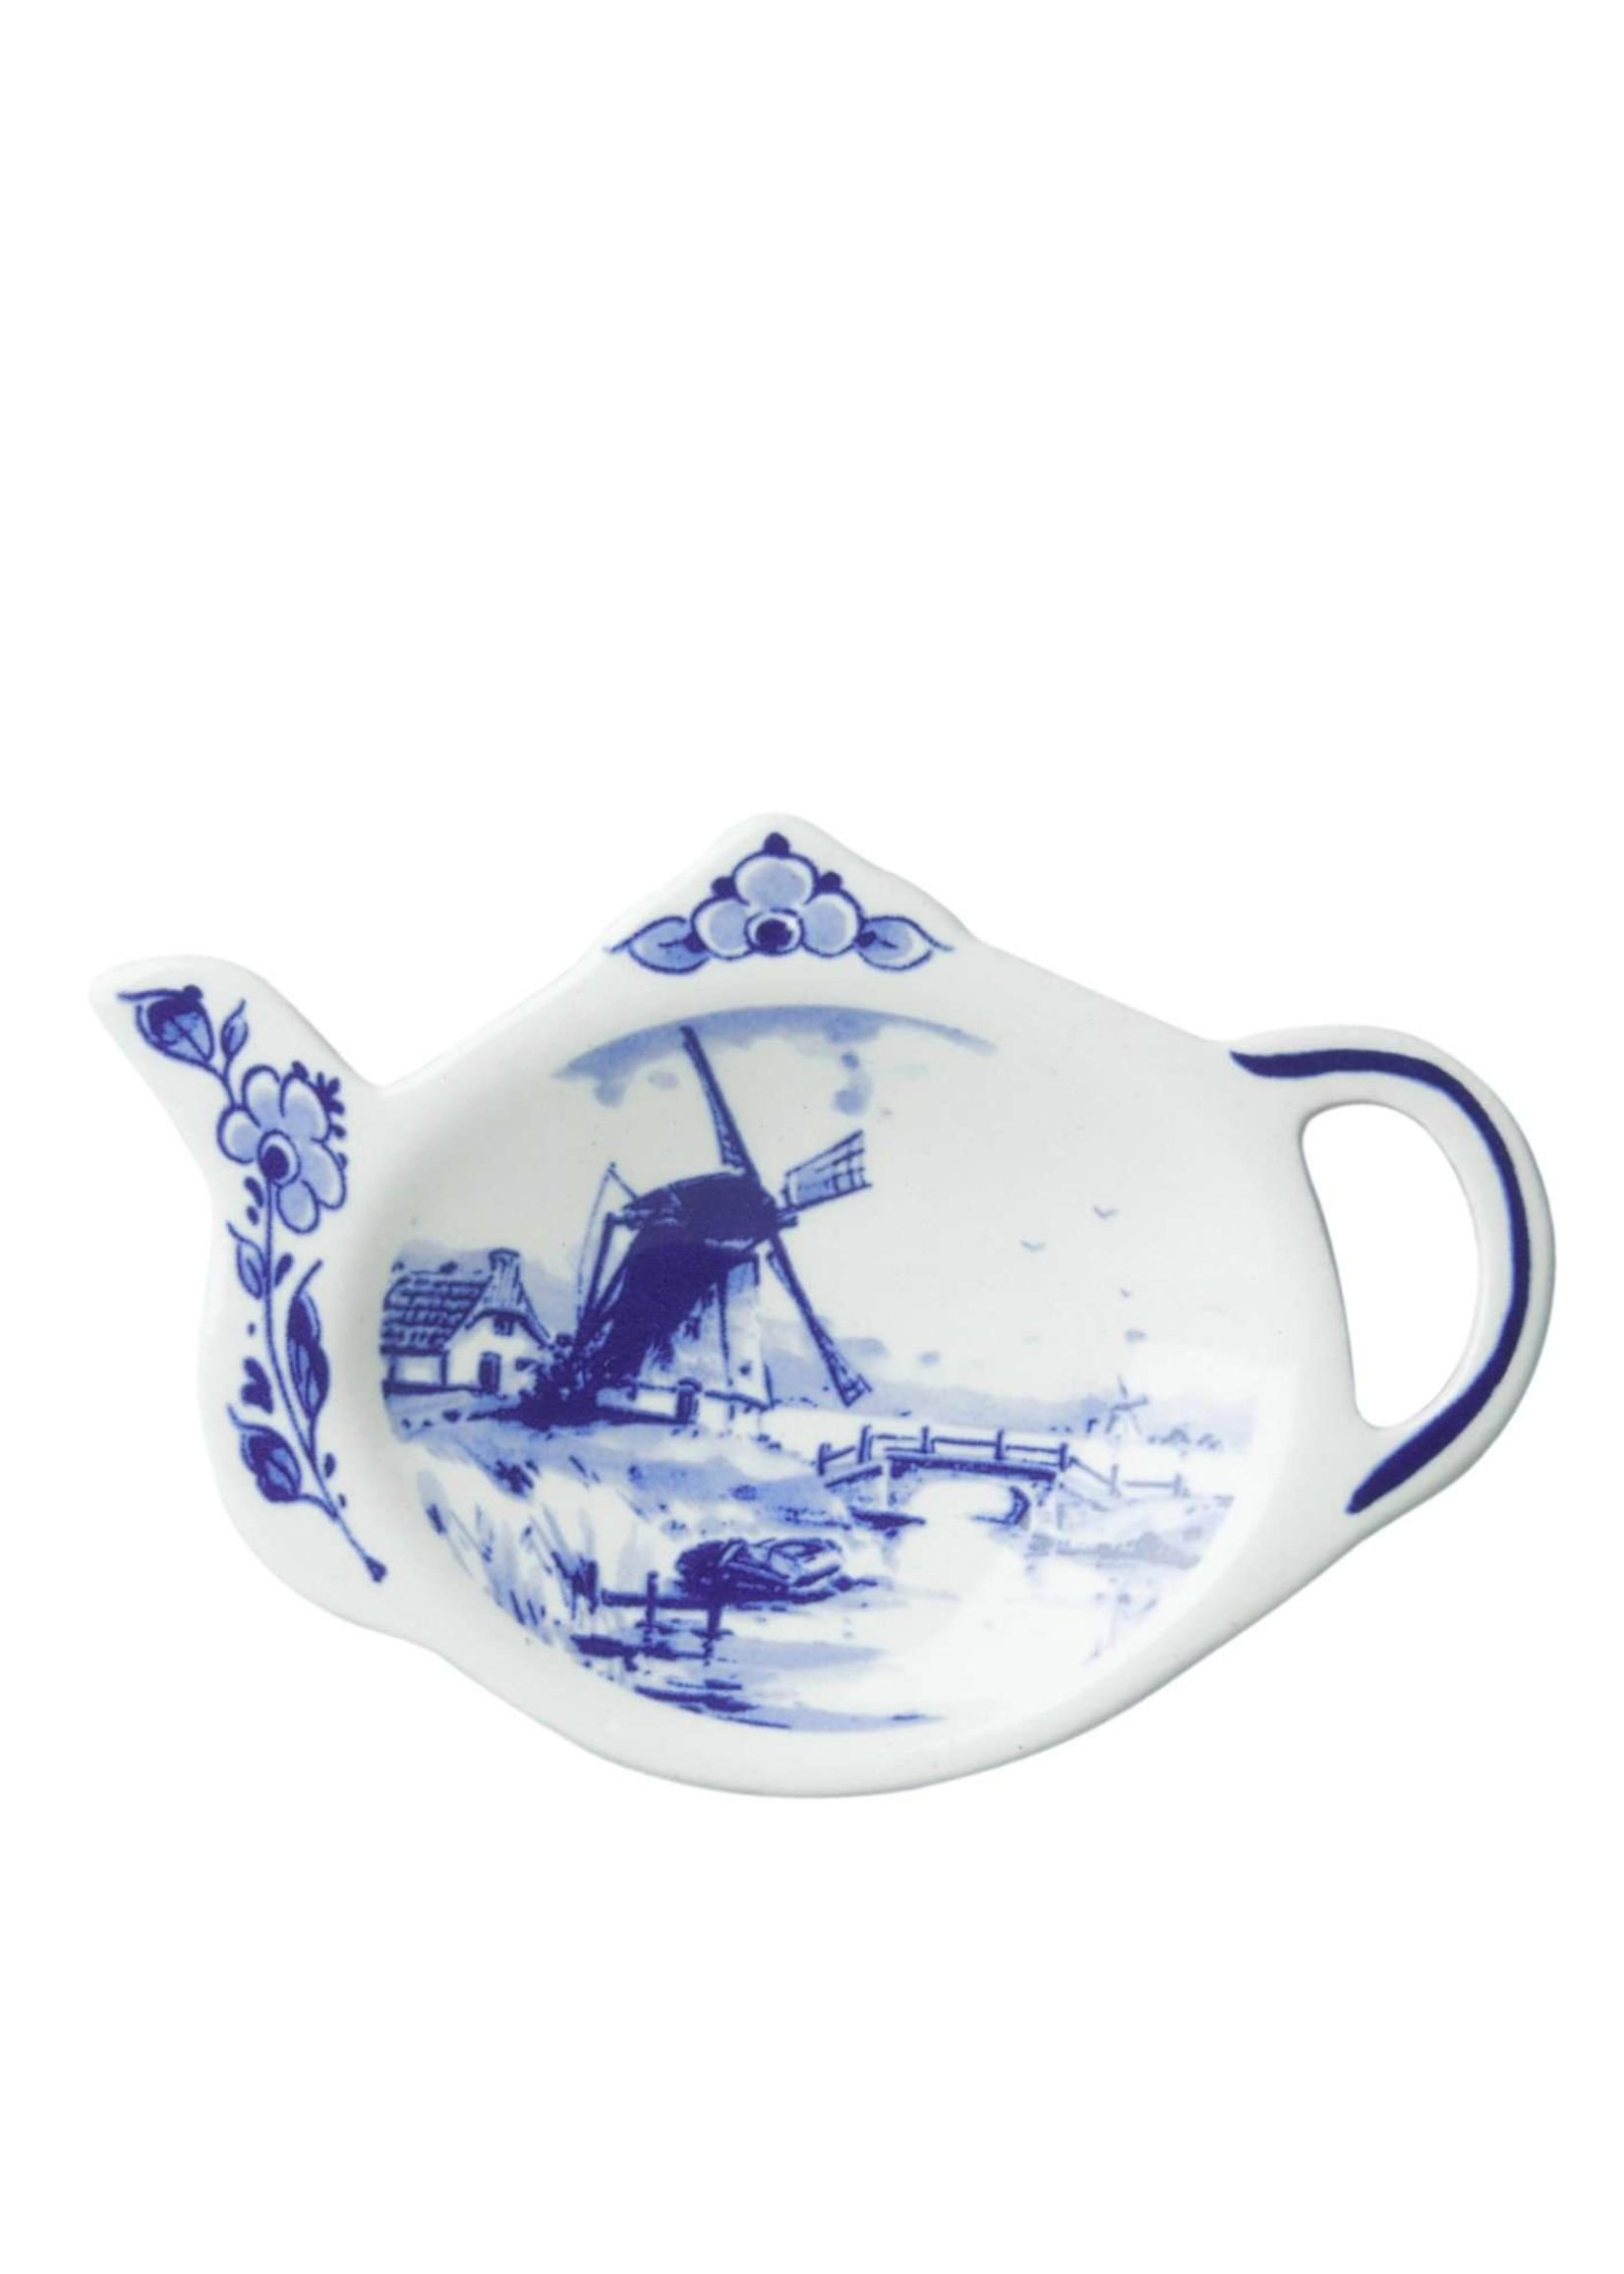 Delft Blue Tea Bag Holder in the Shape of a Teapot